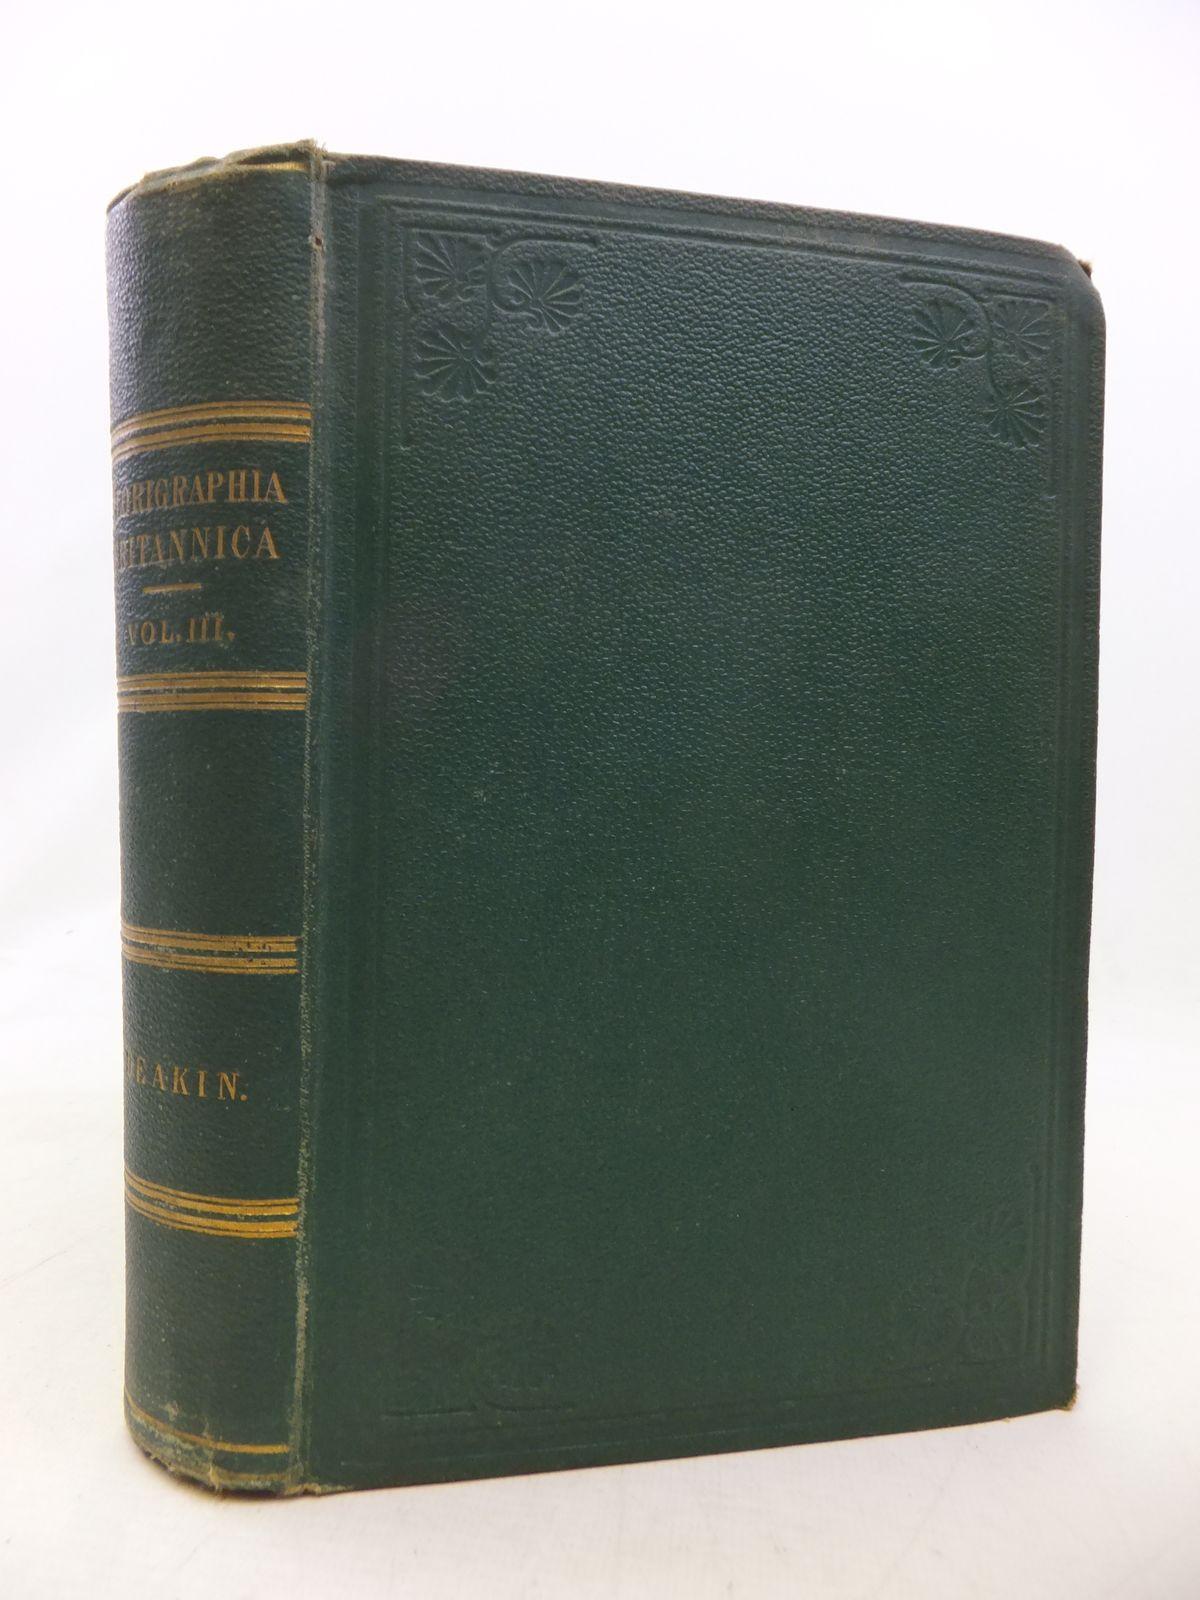 Photo of FLORIGRAPHIA BRITANNICA VOLUME III- Stock Number: 1809130